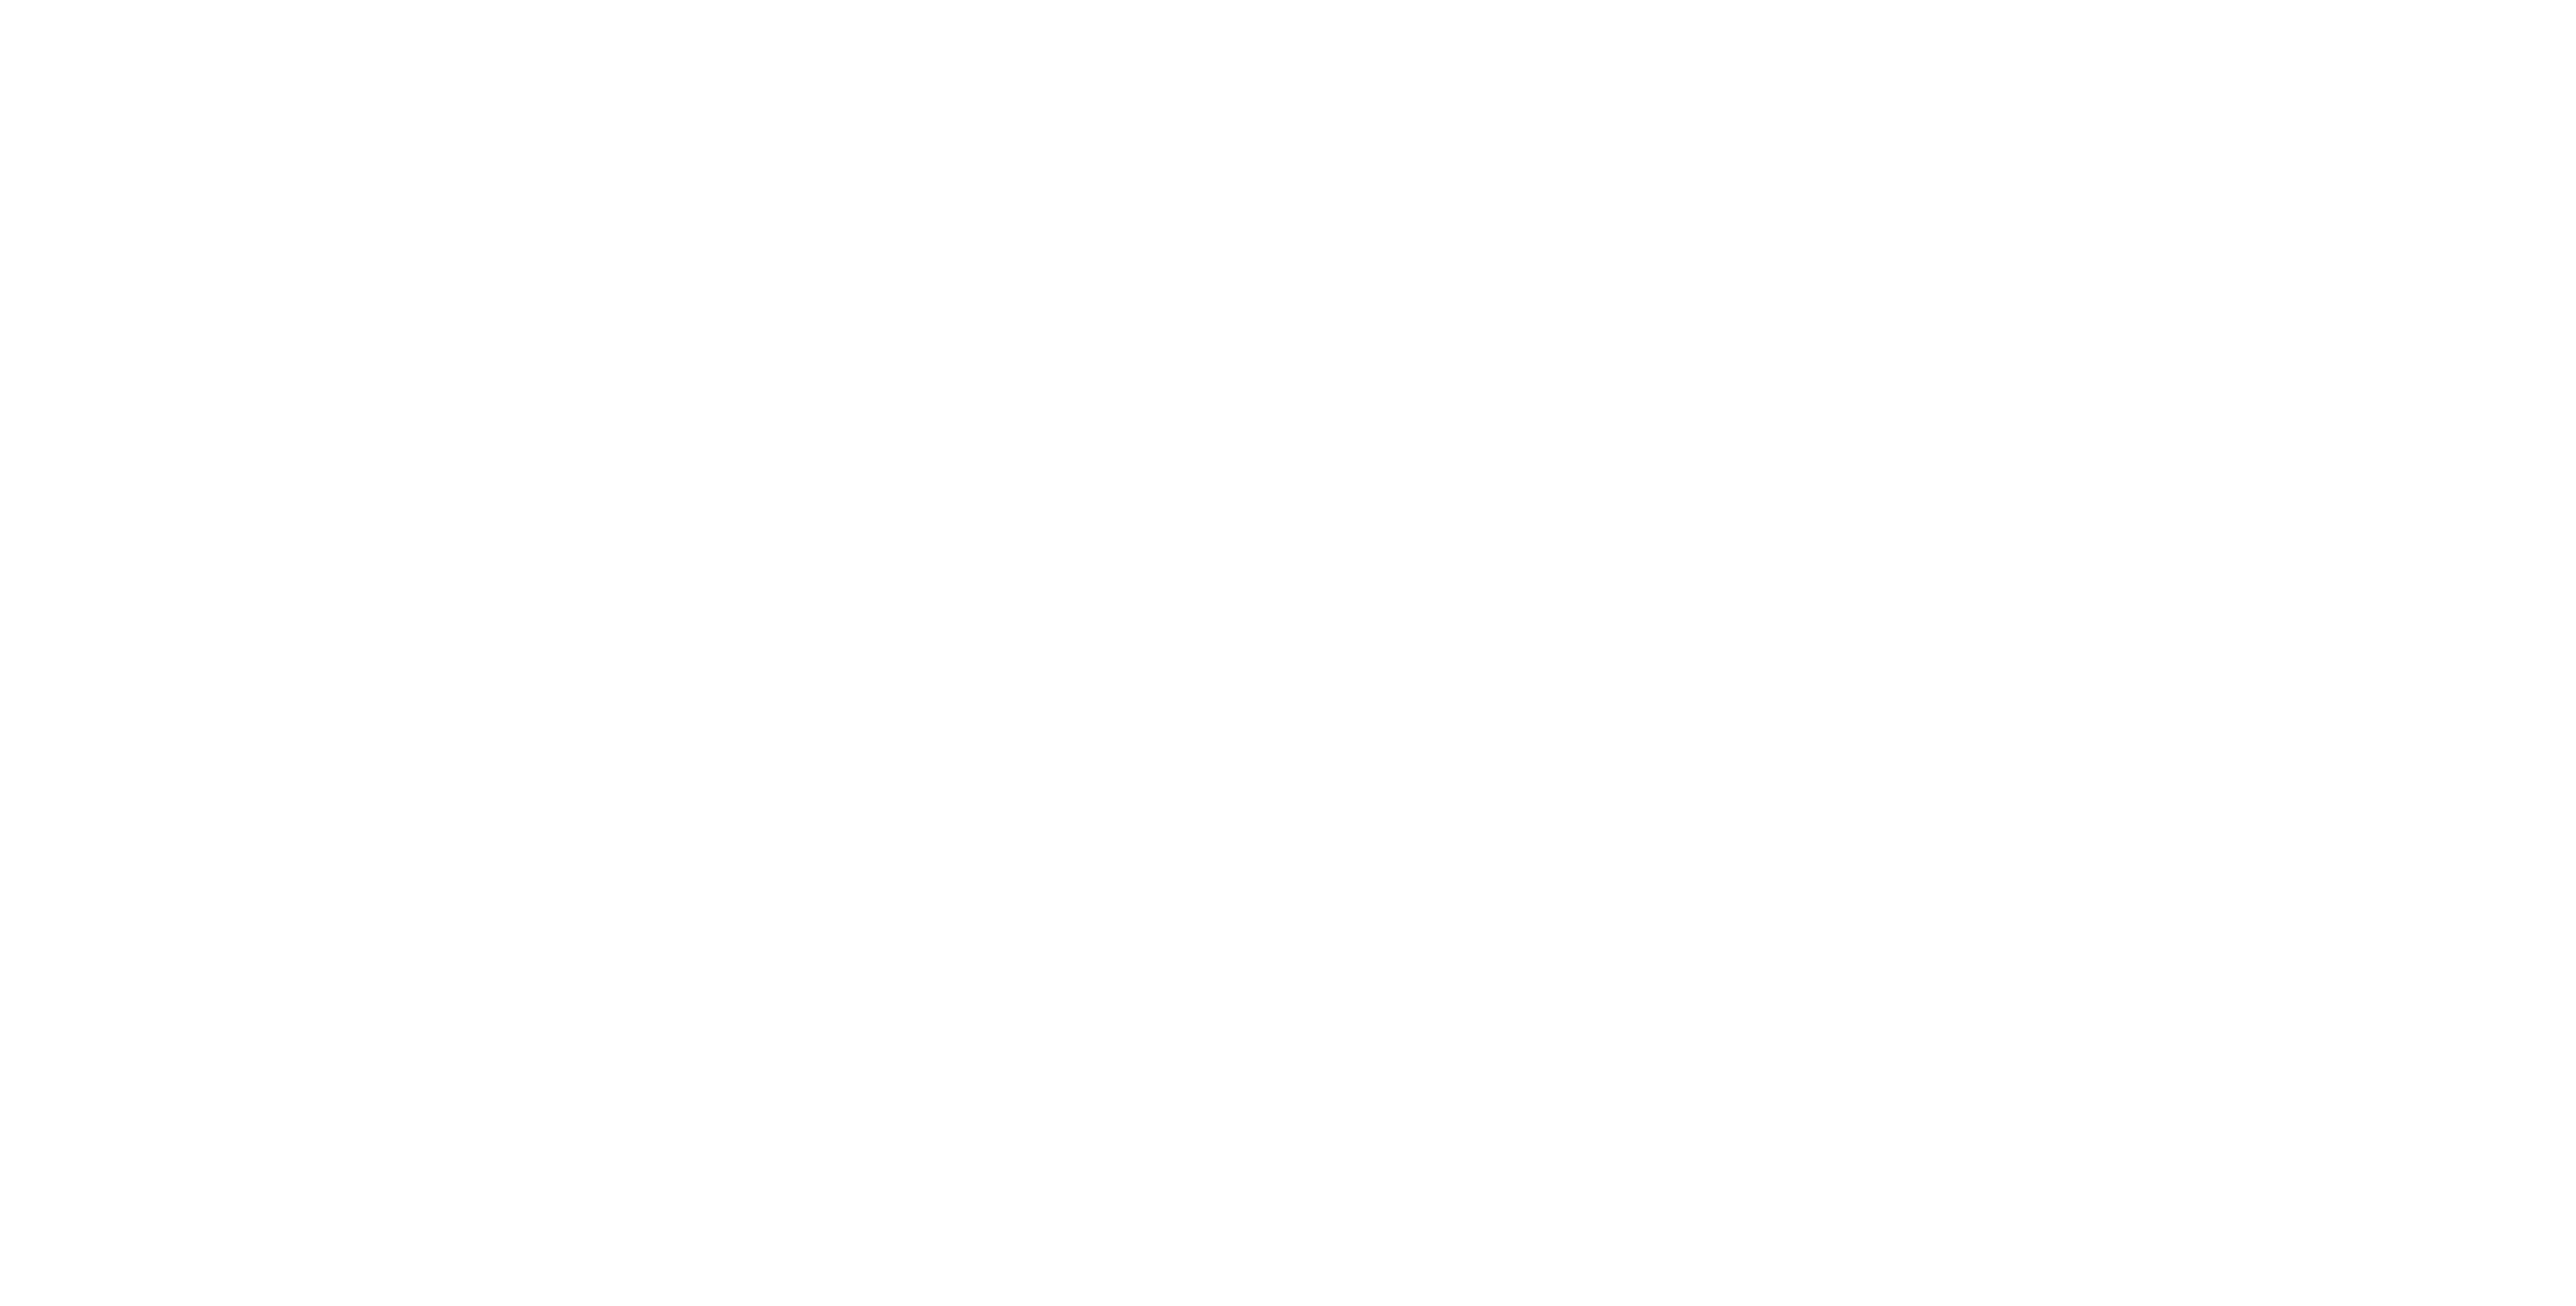 NettlLogoWhite - Glasgow Creative